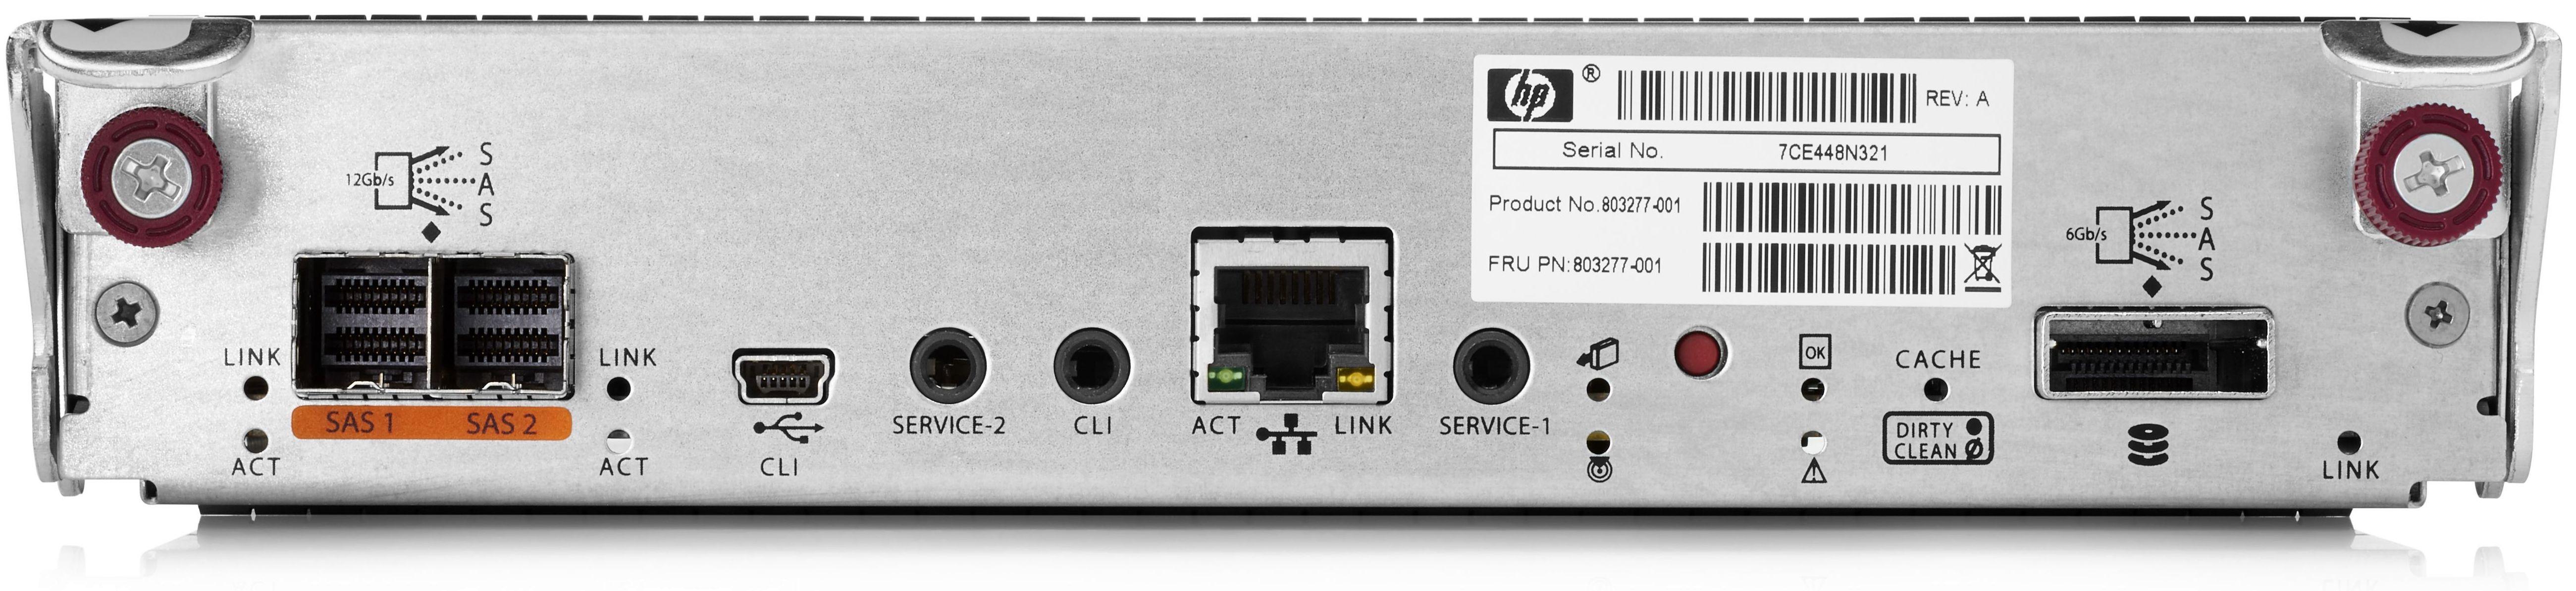 MSA 1050 2port SAS Controller